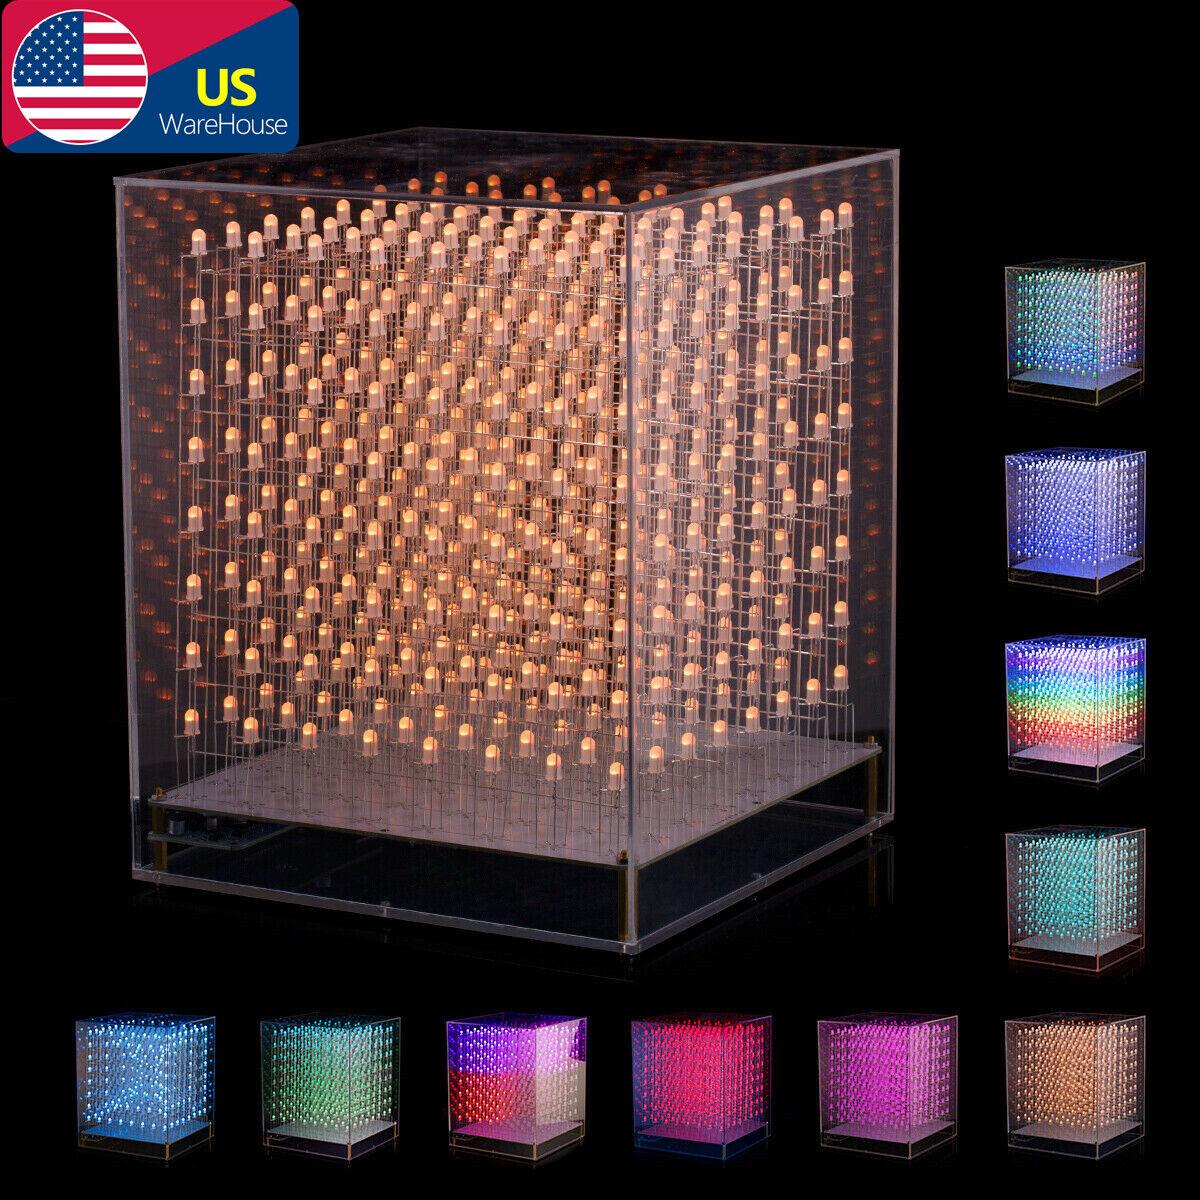 Useful 3D LightSquared 8 x 8 x 8 LED Cube White LED Blue Ray DIY Kit ♓